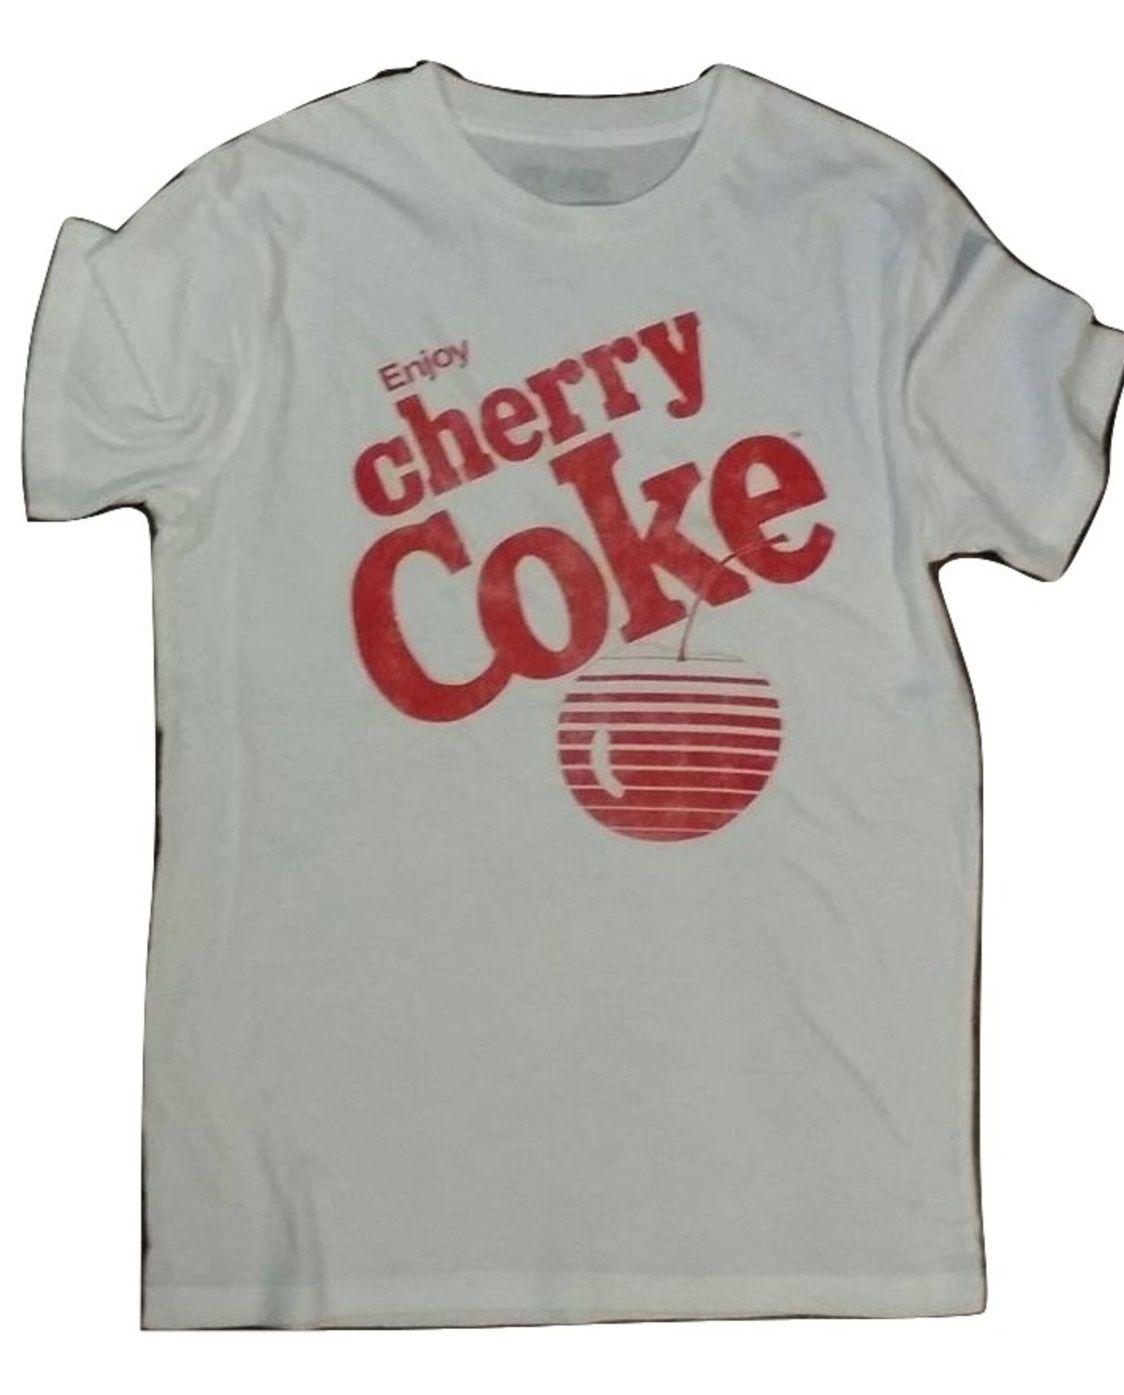 62a69ada68328  7.99 SALE Mens Vintage Cherry Coke Soft Cotton Printed White T-shirt size  Small